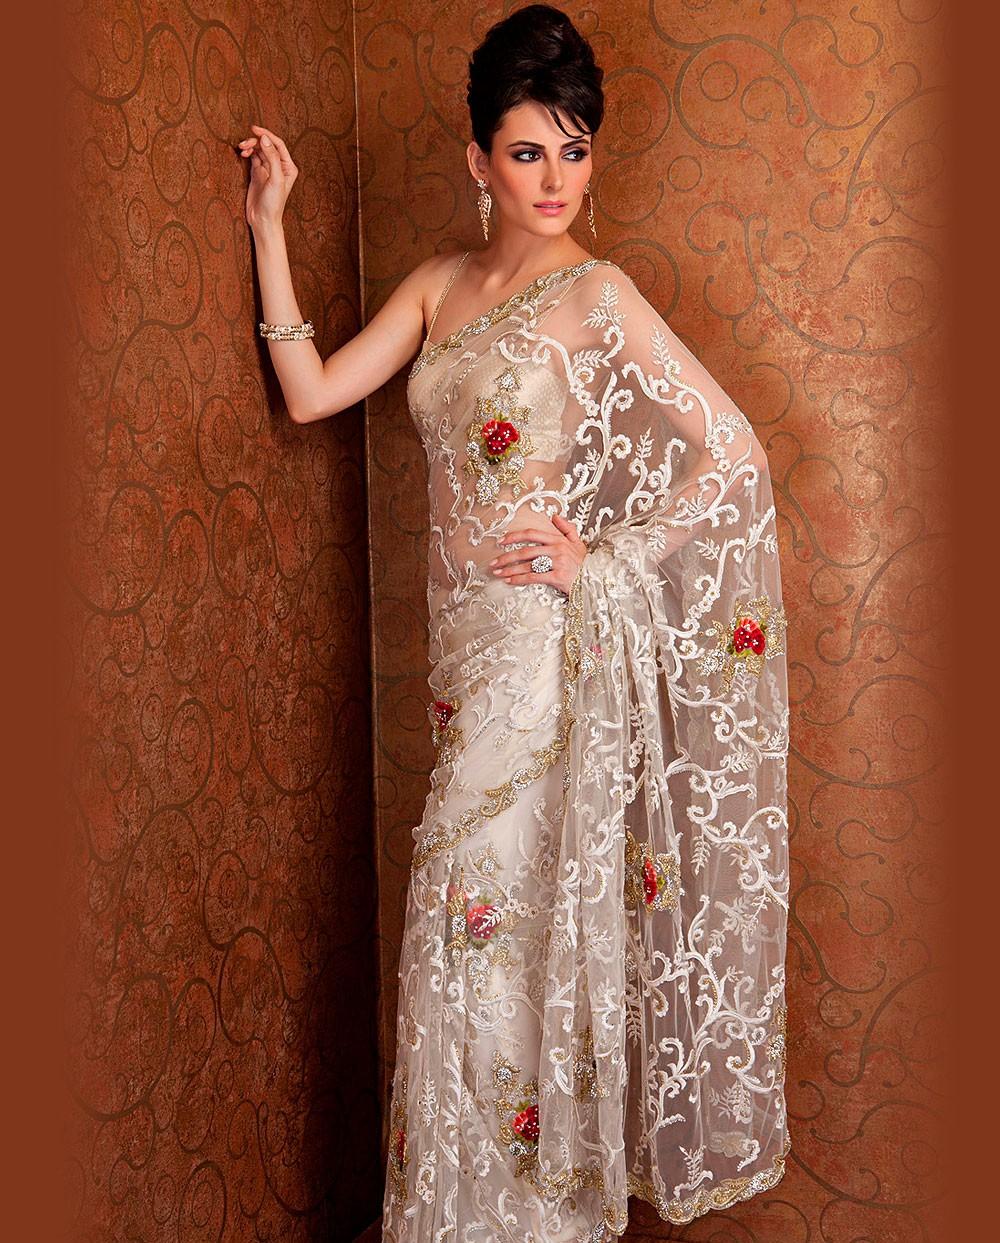 reports on meena bazaar Meena bazaar, gurgaon, haryana 219,548 likes 239 talking about this meena bazaar is a epitome of grace and elegance beautifully transfered into regal.